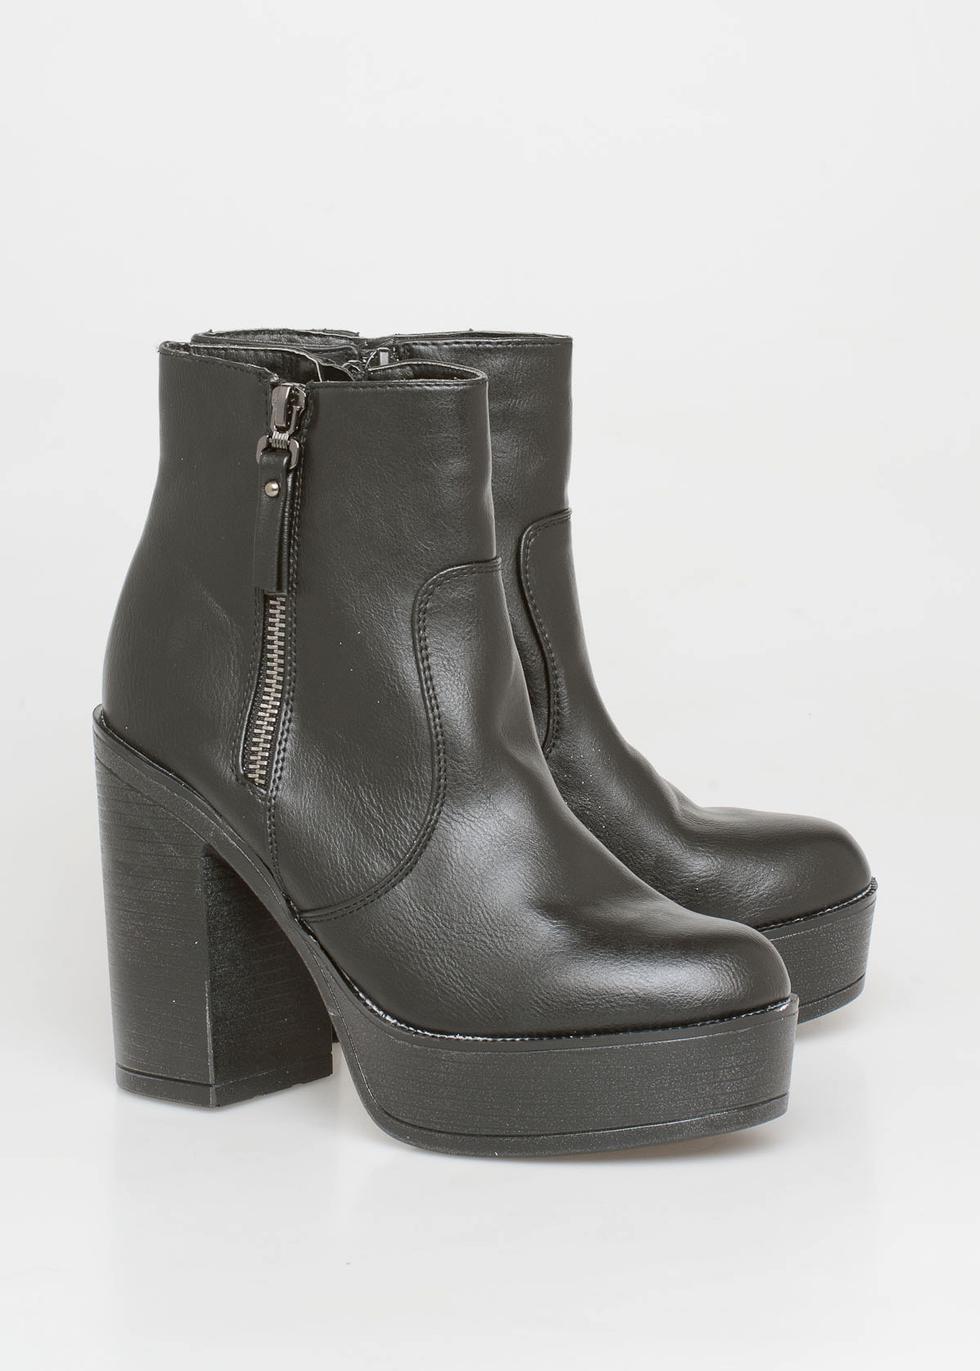 Mindy block heel boot, μαύρο